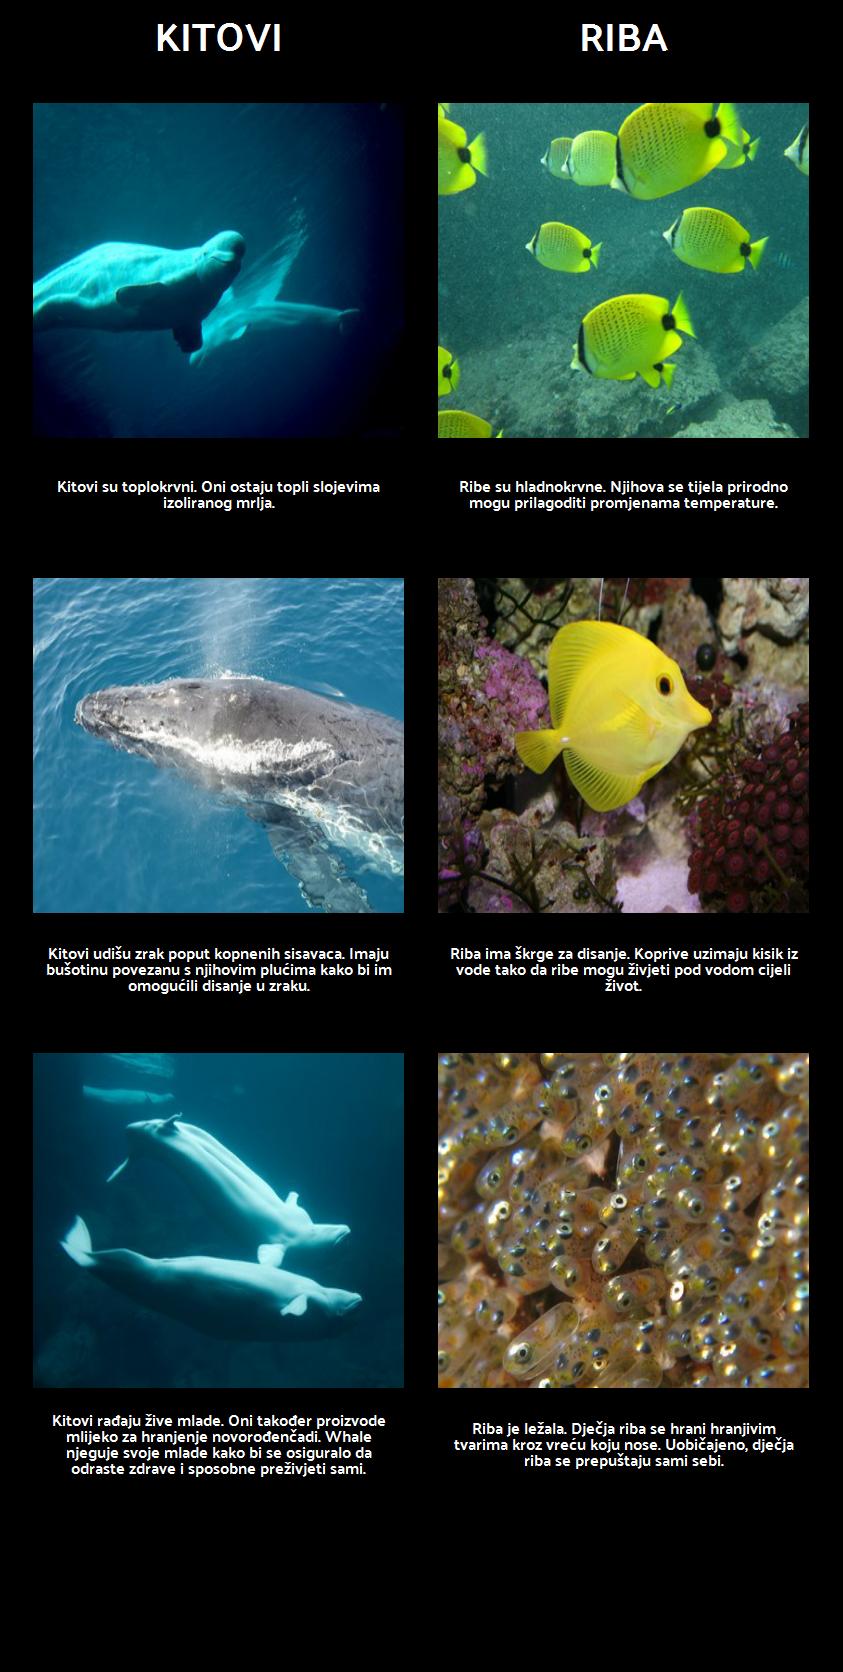 Amos i Boris - Morski Sisavci i Riba